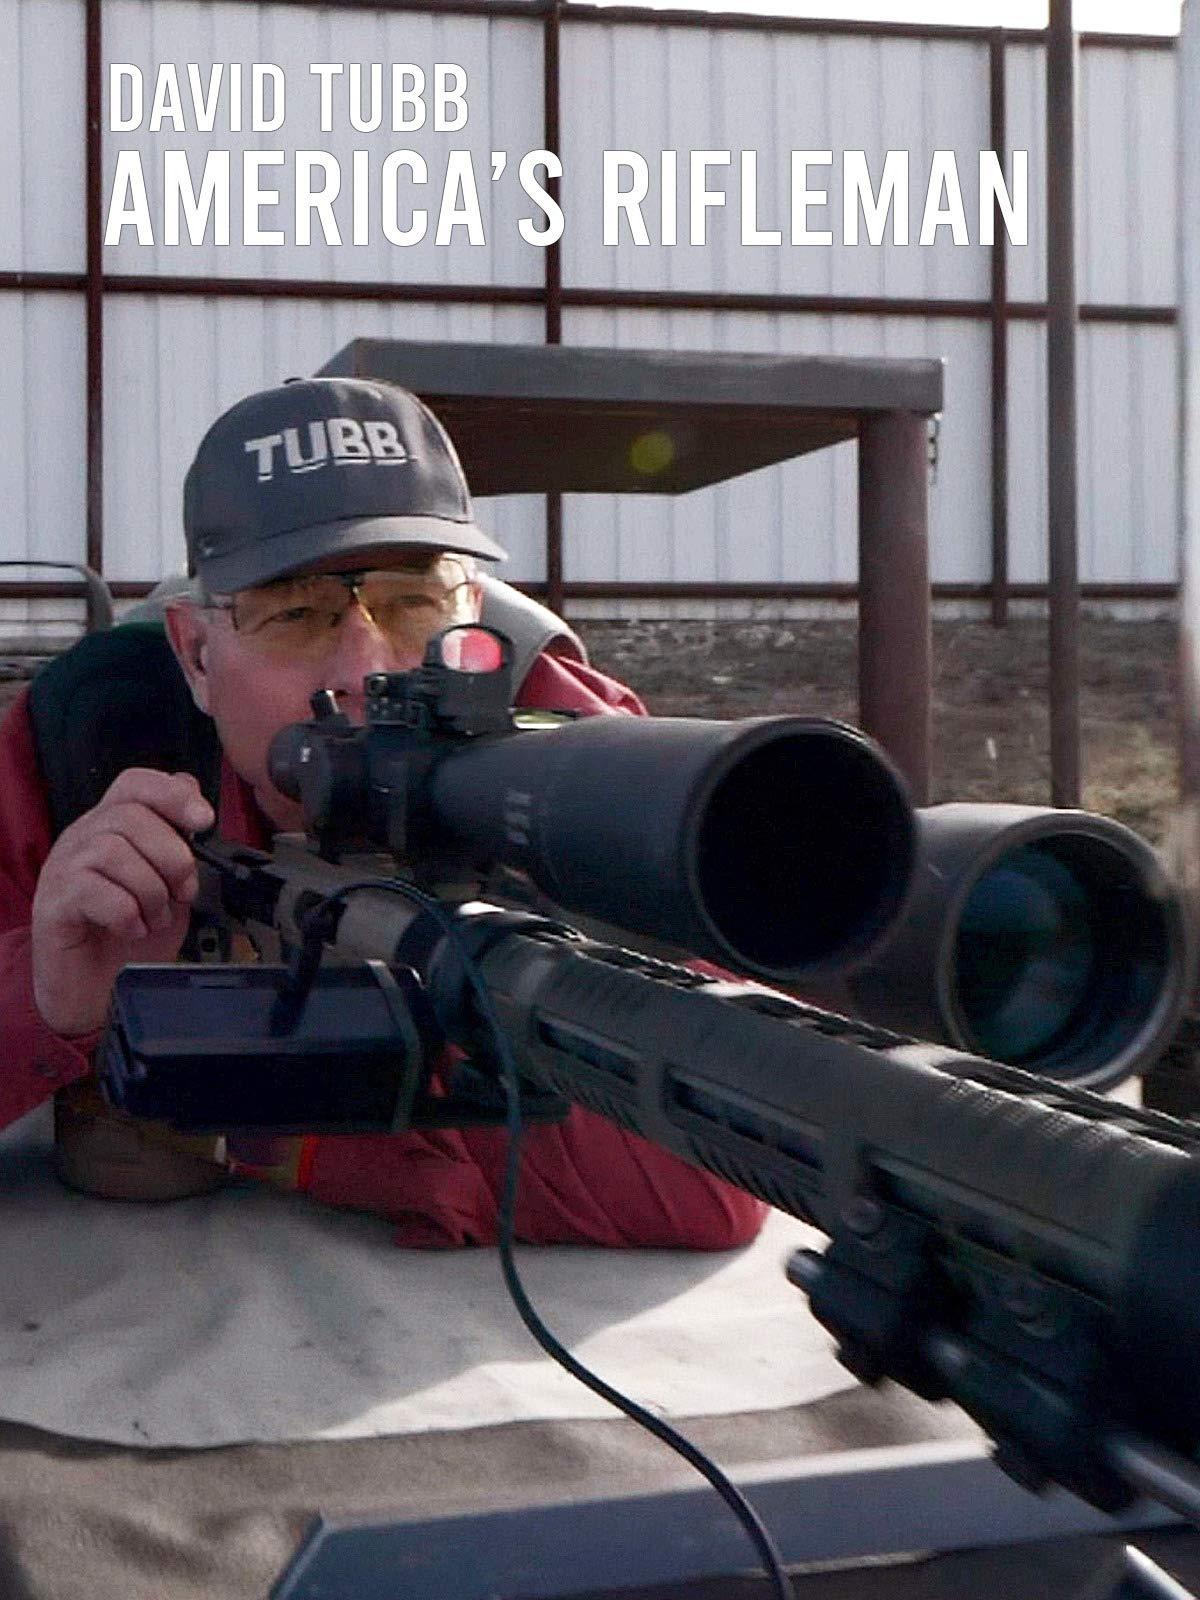 America's Rifleman